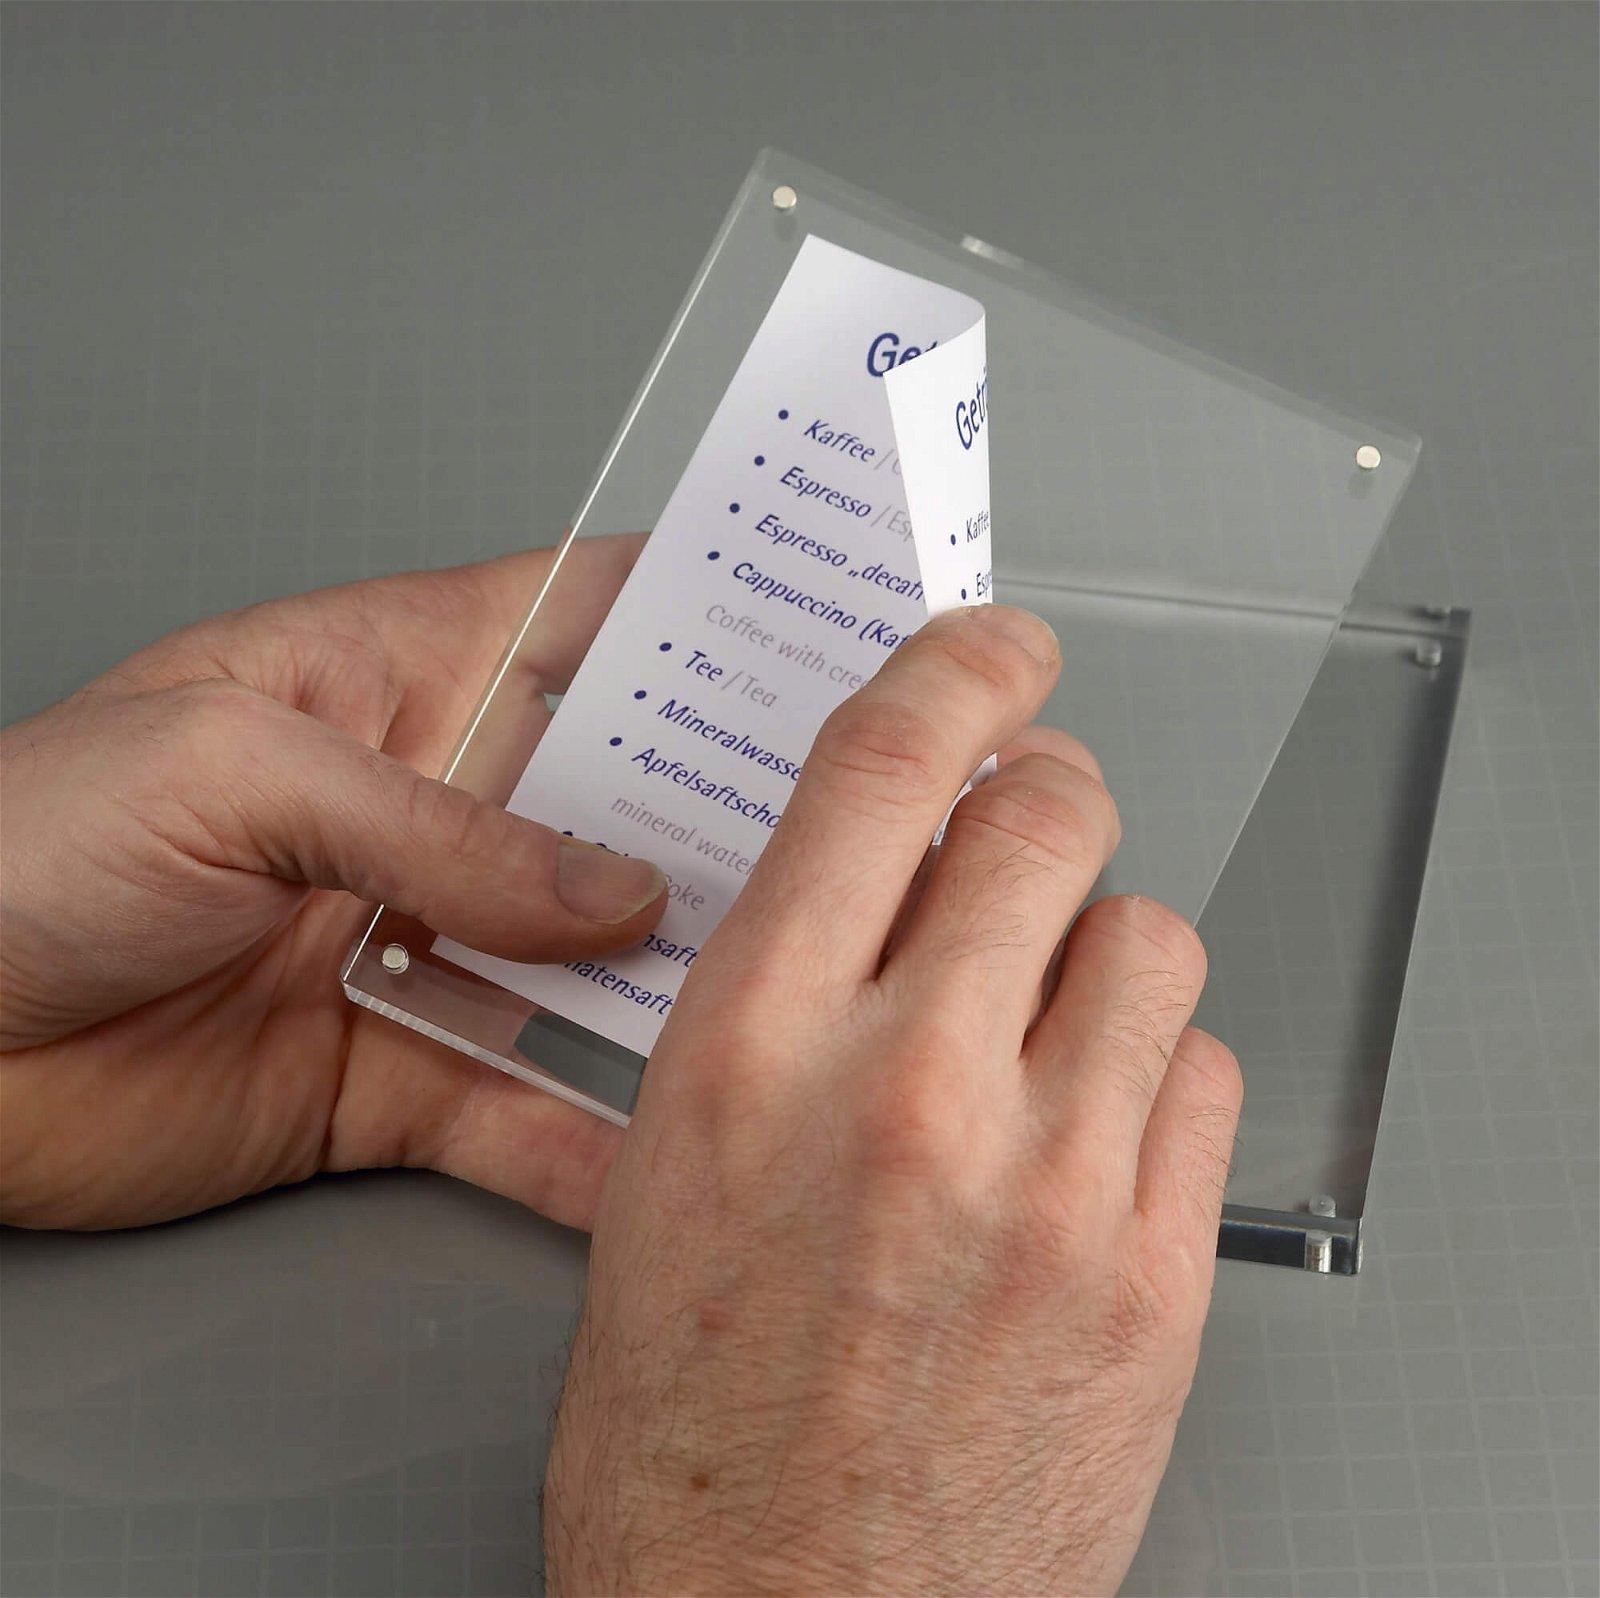 Acryl-Bilderhalter, 17,8 x 12,7 x 3 cm, glasklar